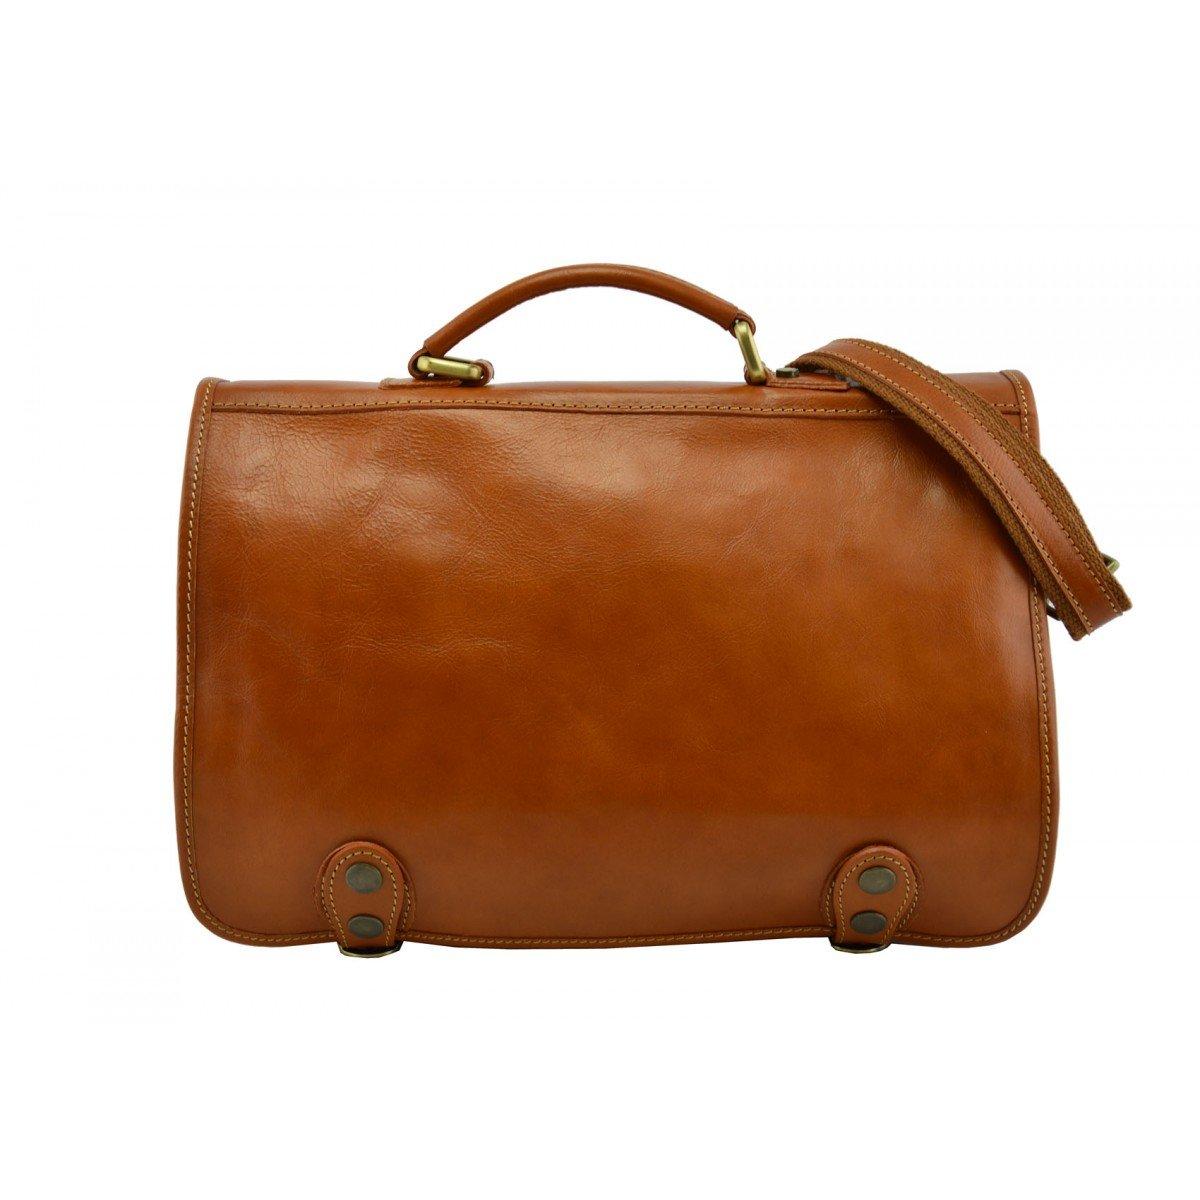 Dream Leather Bags Made in Italy Genuine Leather メンズ US サイズ: 1 カラー: ベージュ   B0719X4BKB